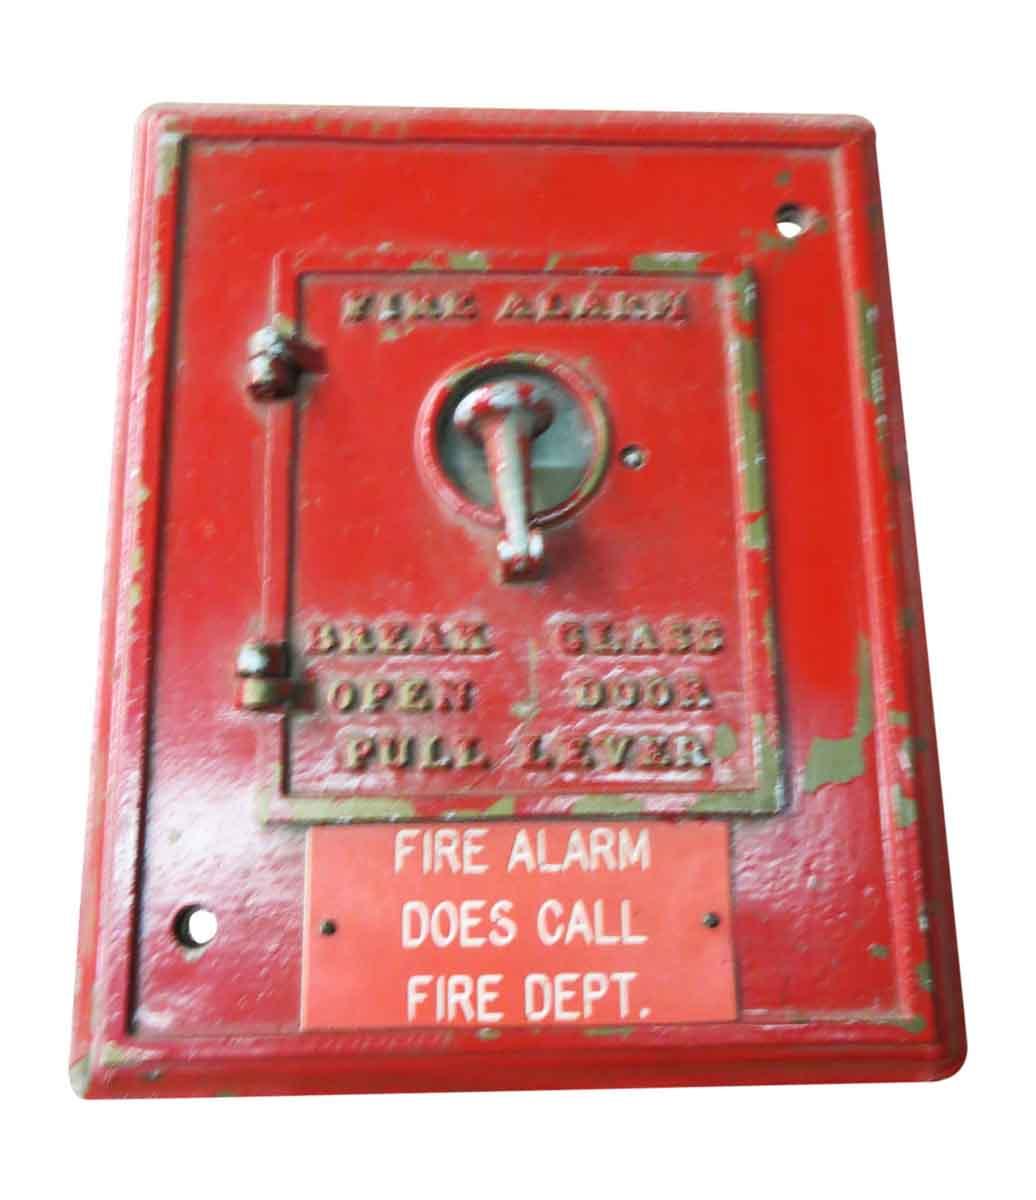 Square Fire Alarms